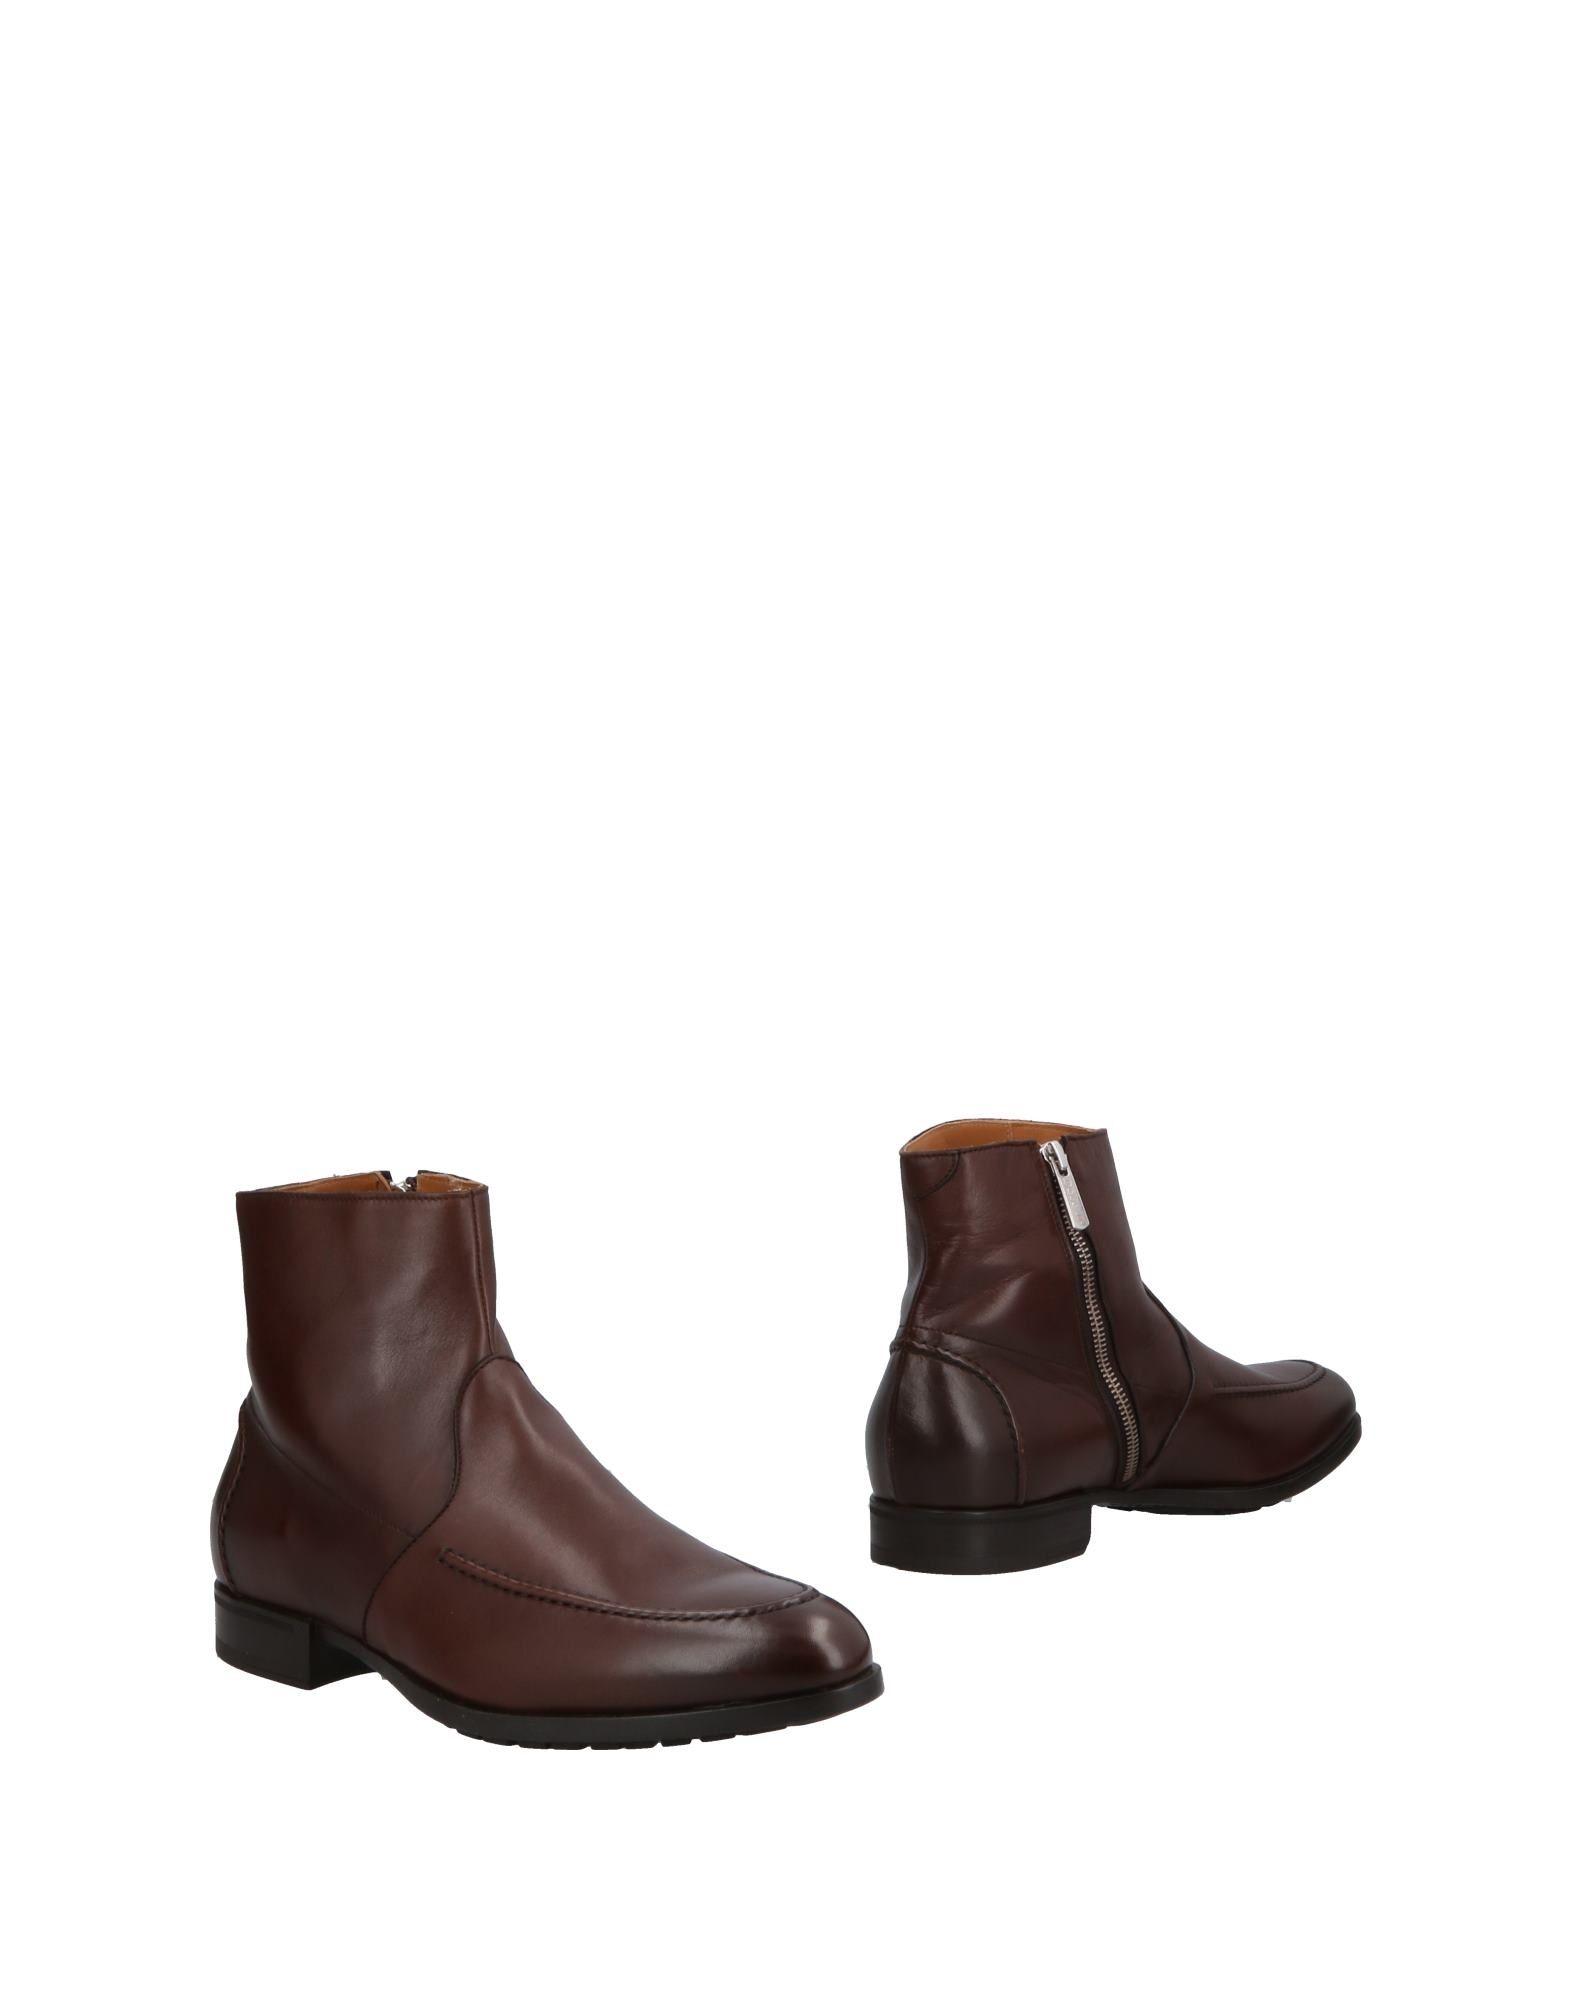 Doucal's Stiefelette Herren  11506323IW Gute Qualität beliebte Schuhe